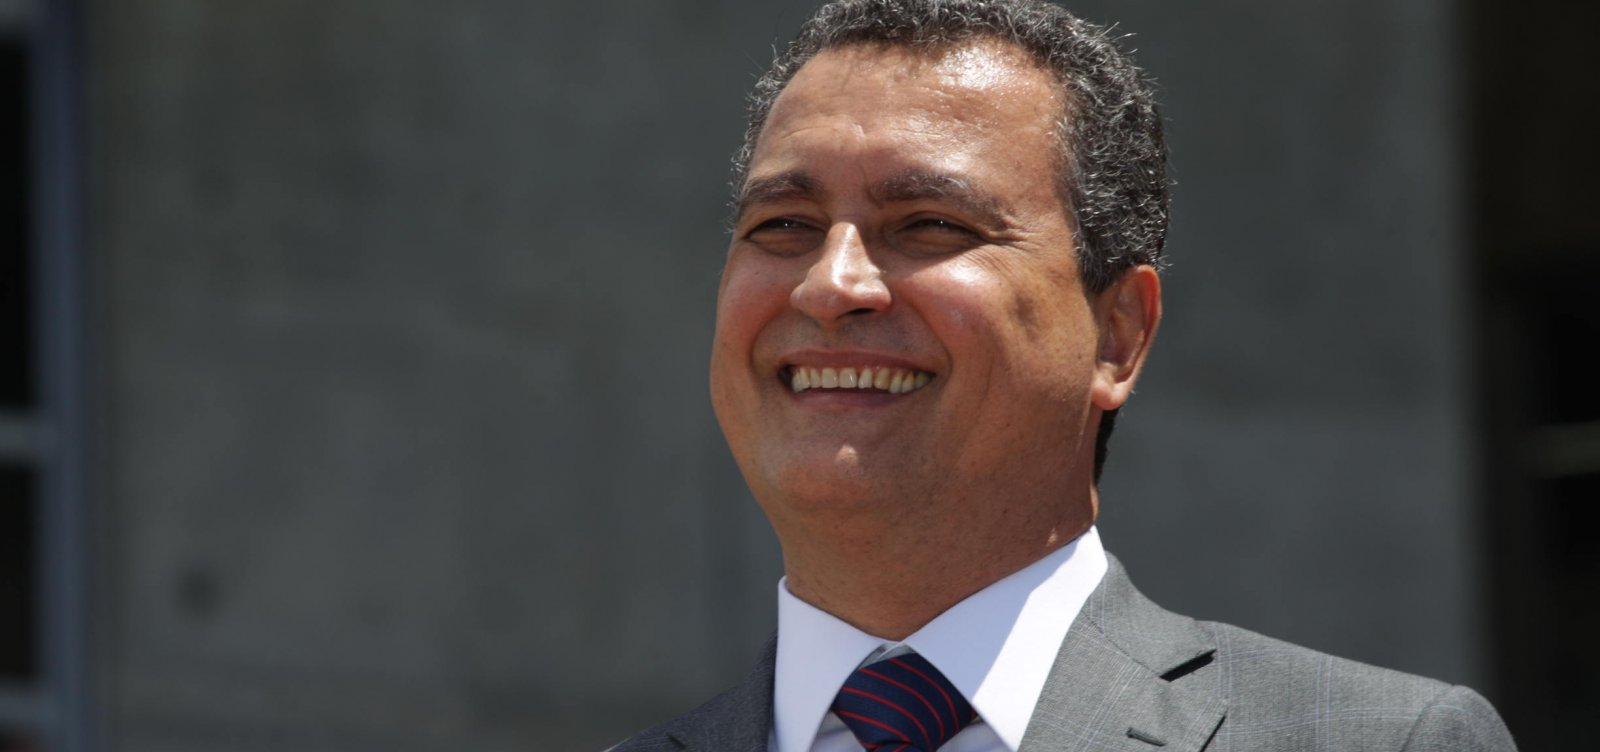 [Rui Costa diz que Bolsonaro é metralhadora disparando agressividade]